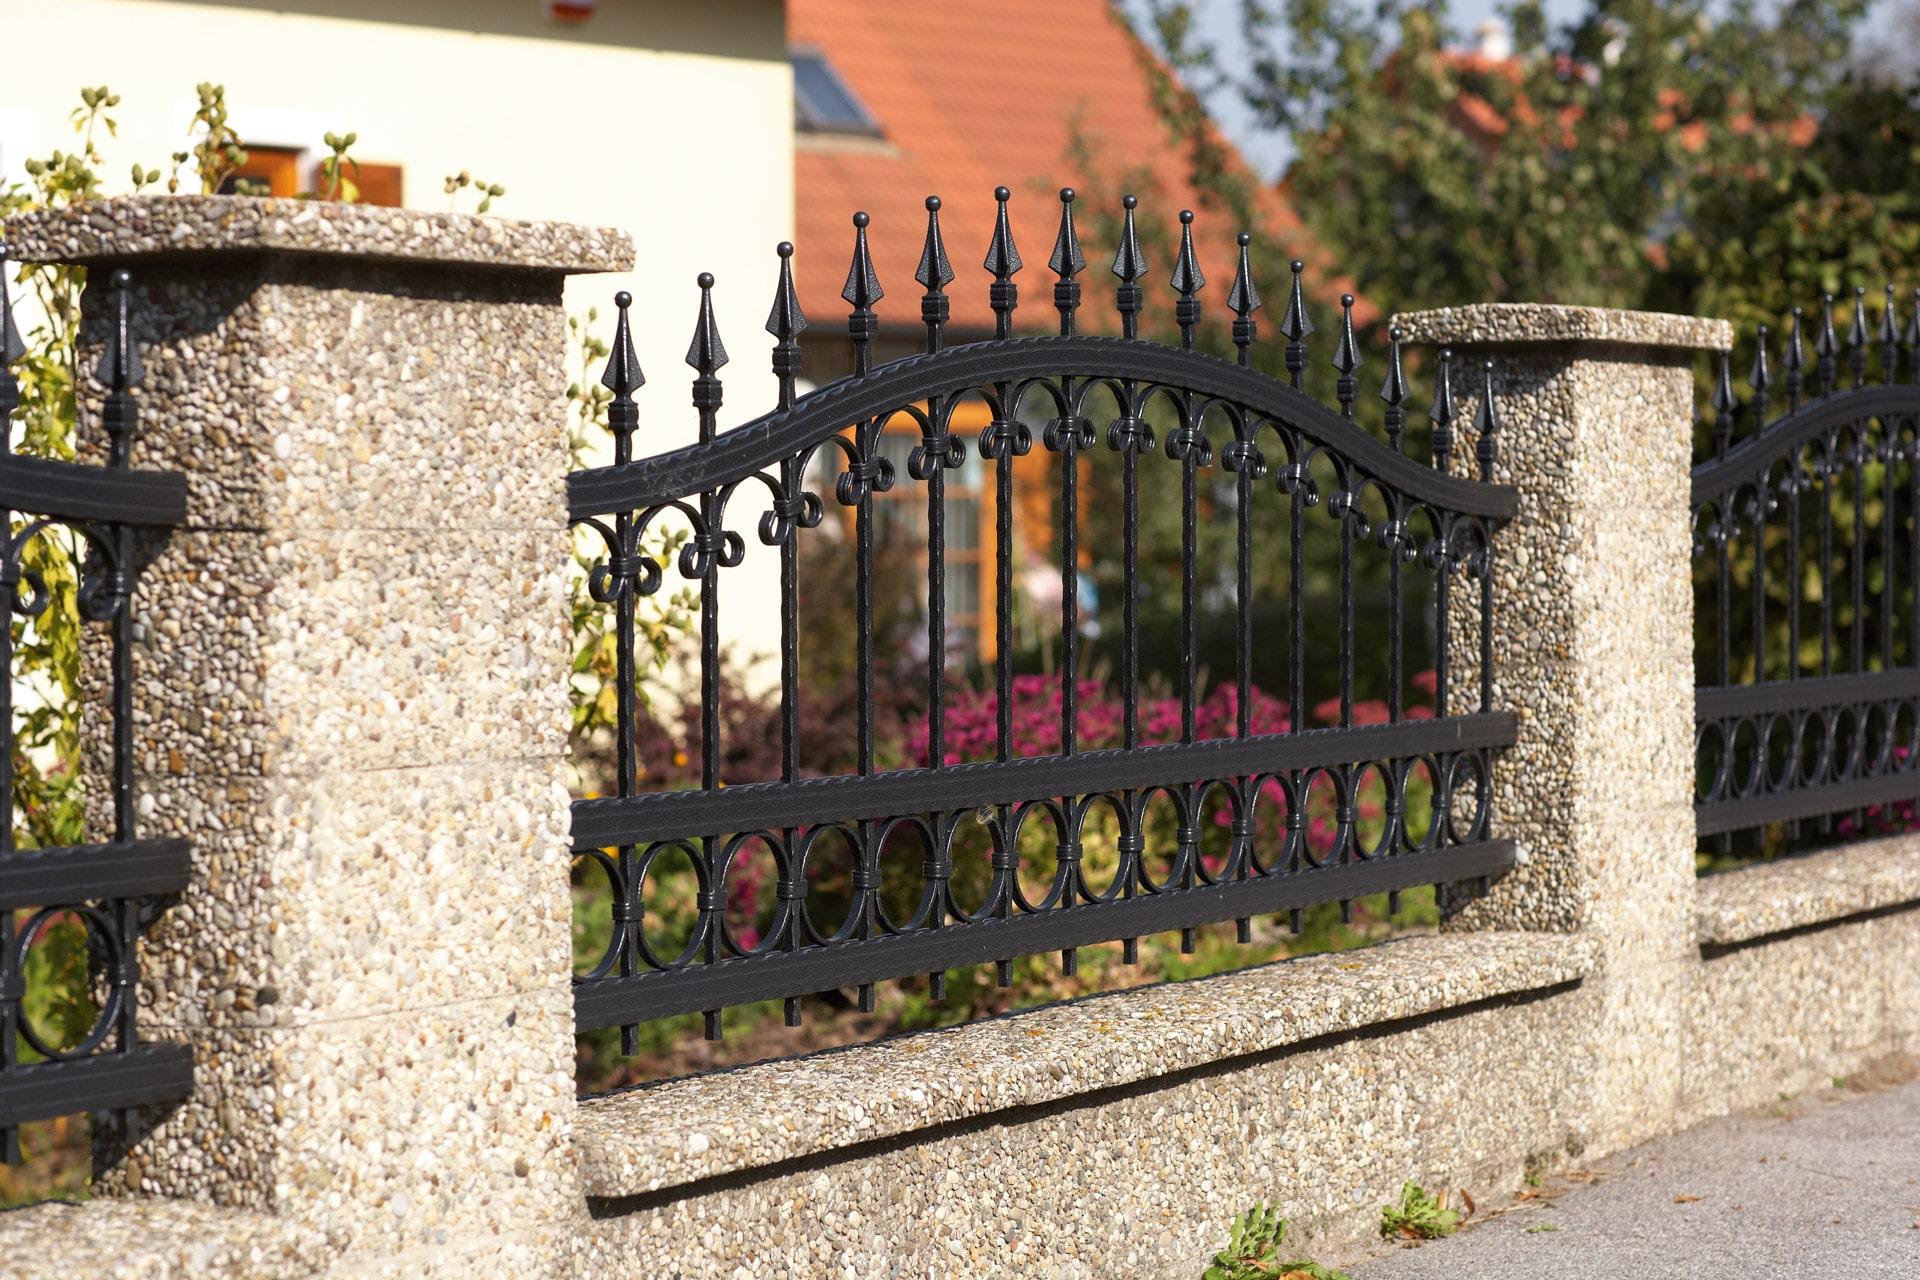 OZ 12964 | Schmiedezaun aus Aluminium bei Mauer, schwarz, Bogenobergurt, Spitzenstäbe | Svoboda